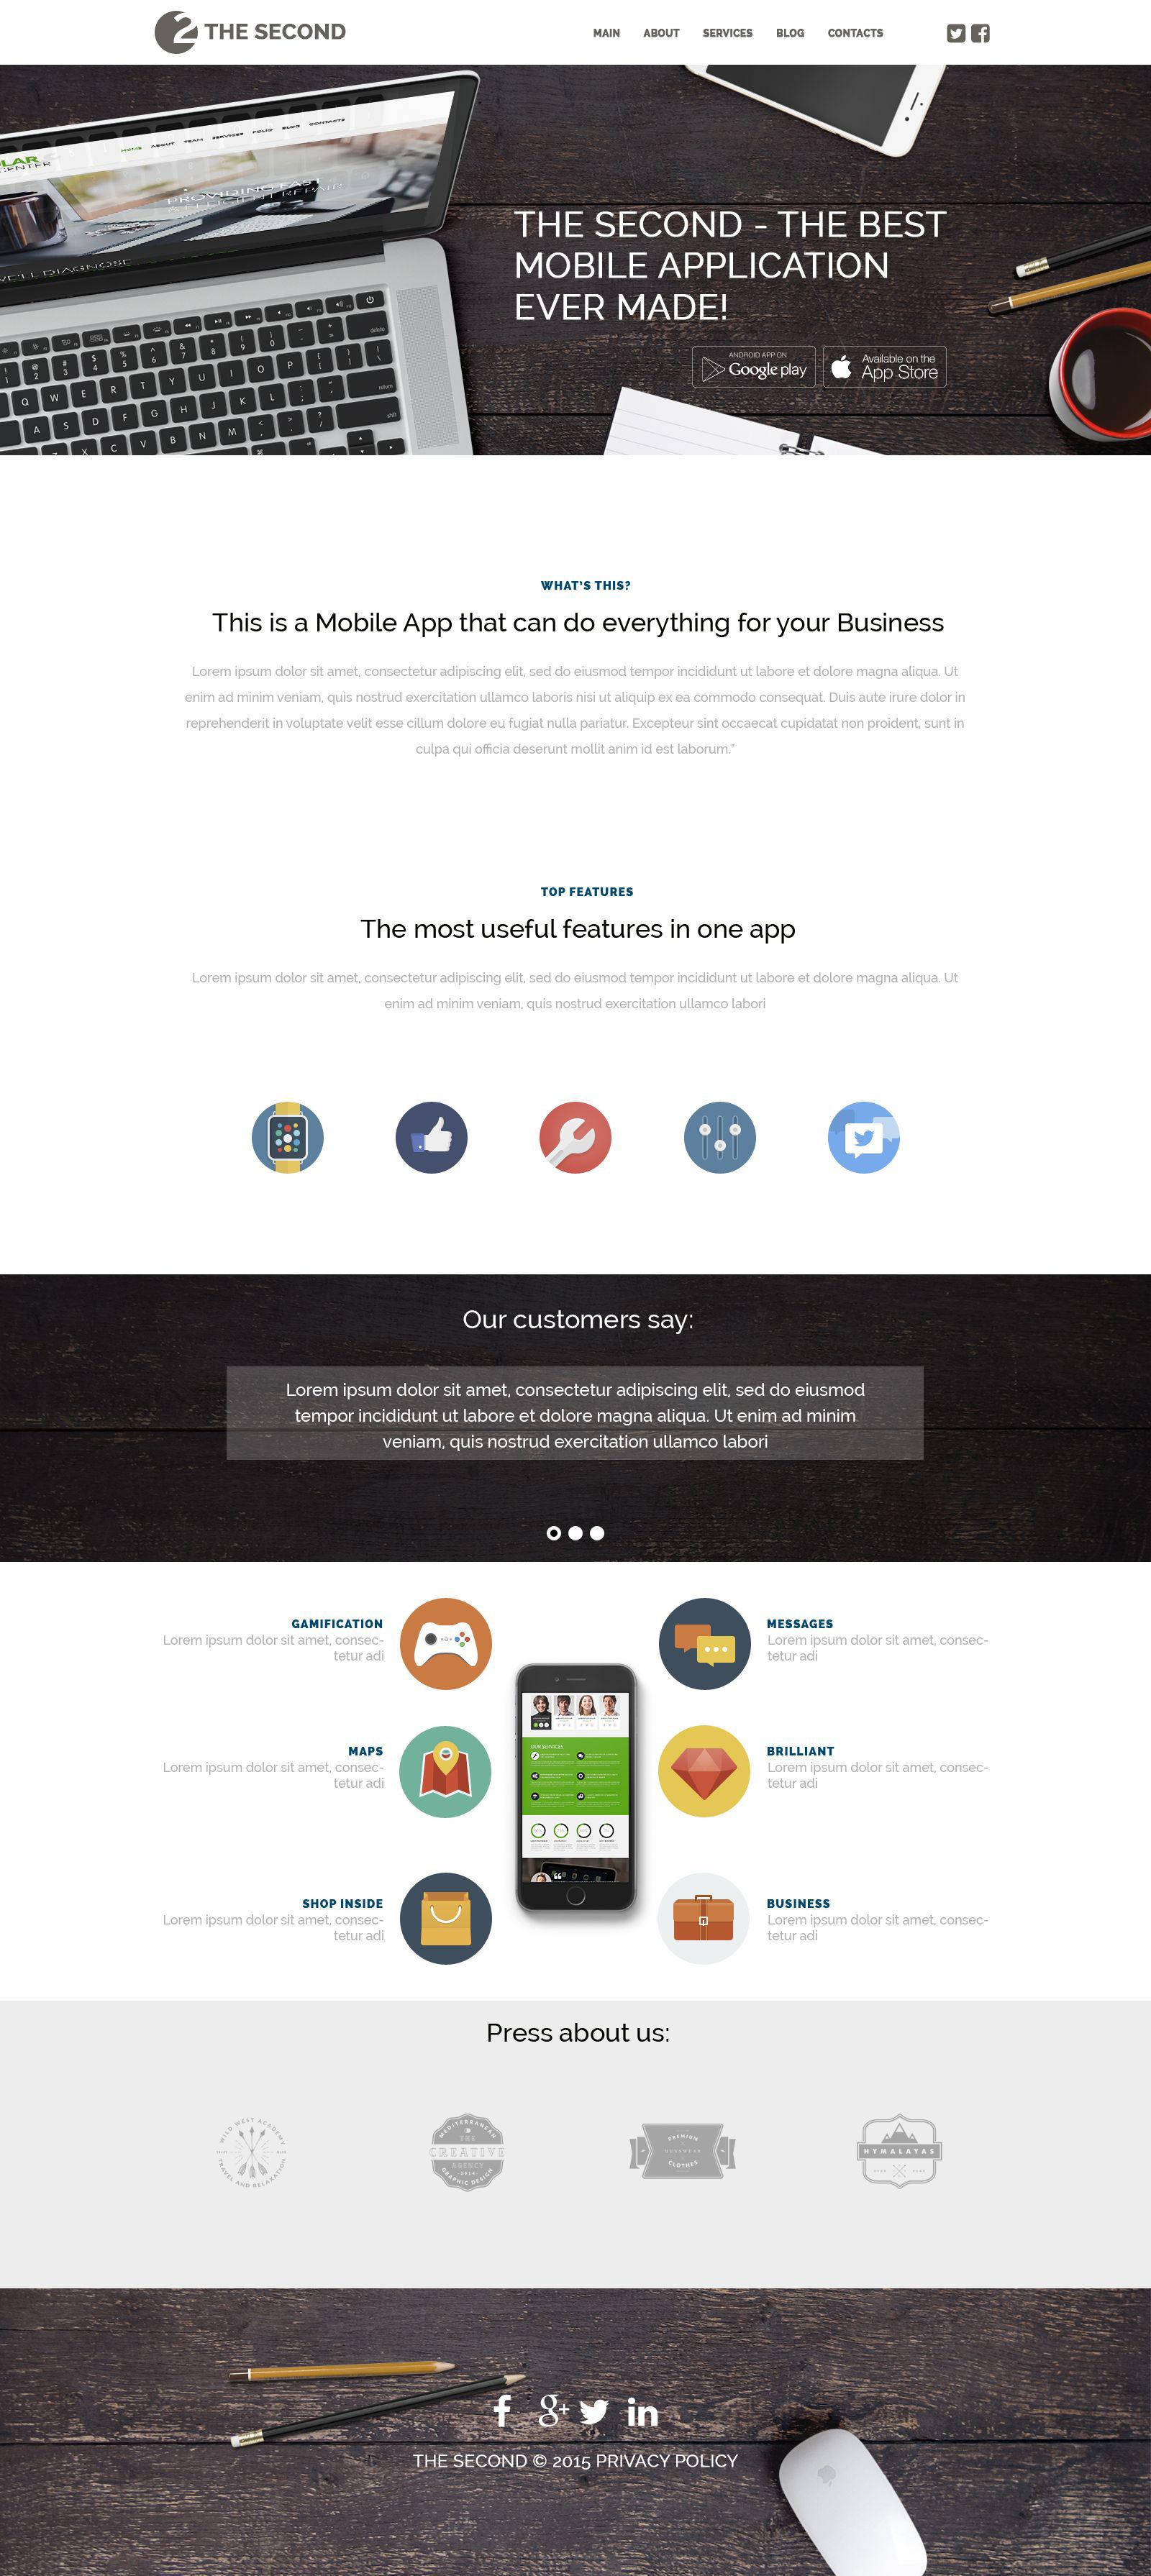 """Applications pour mobiles"" thème WordPress adaptatif #53490 - screenshot"